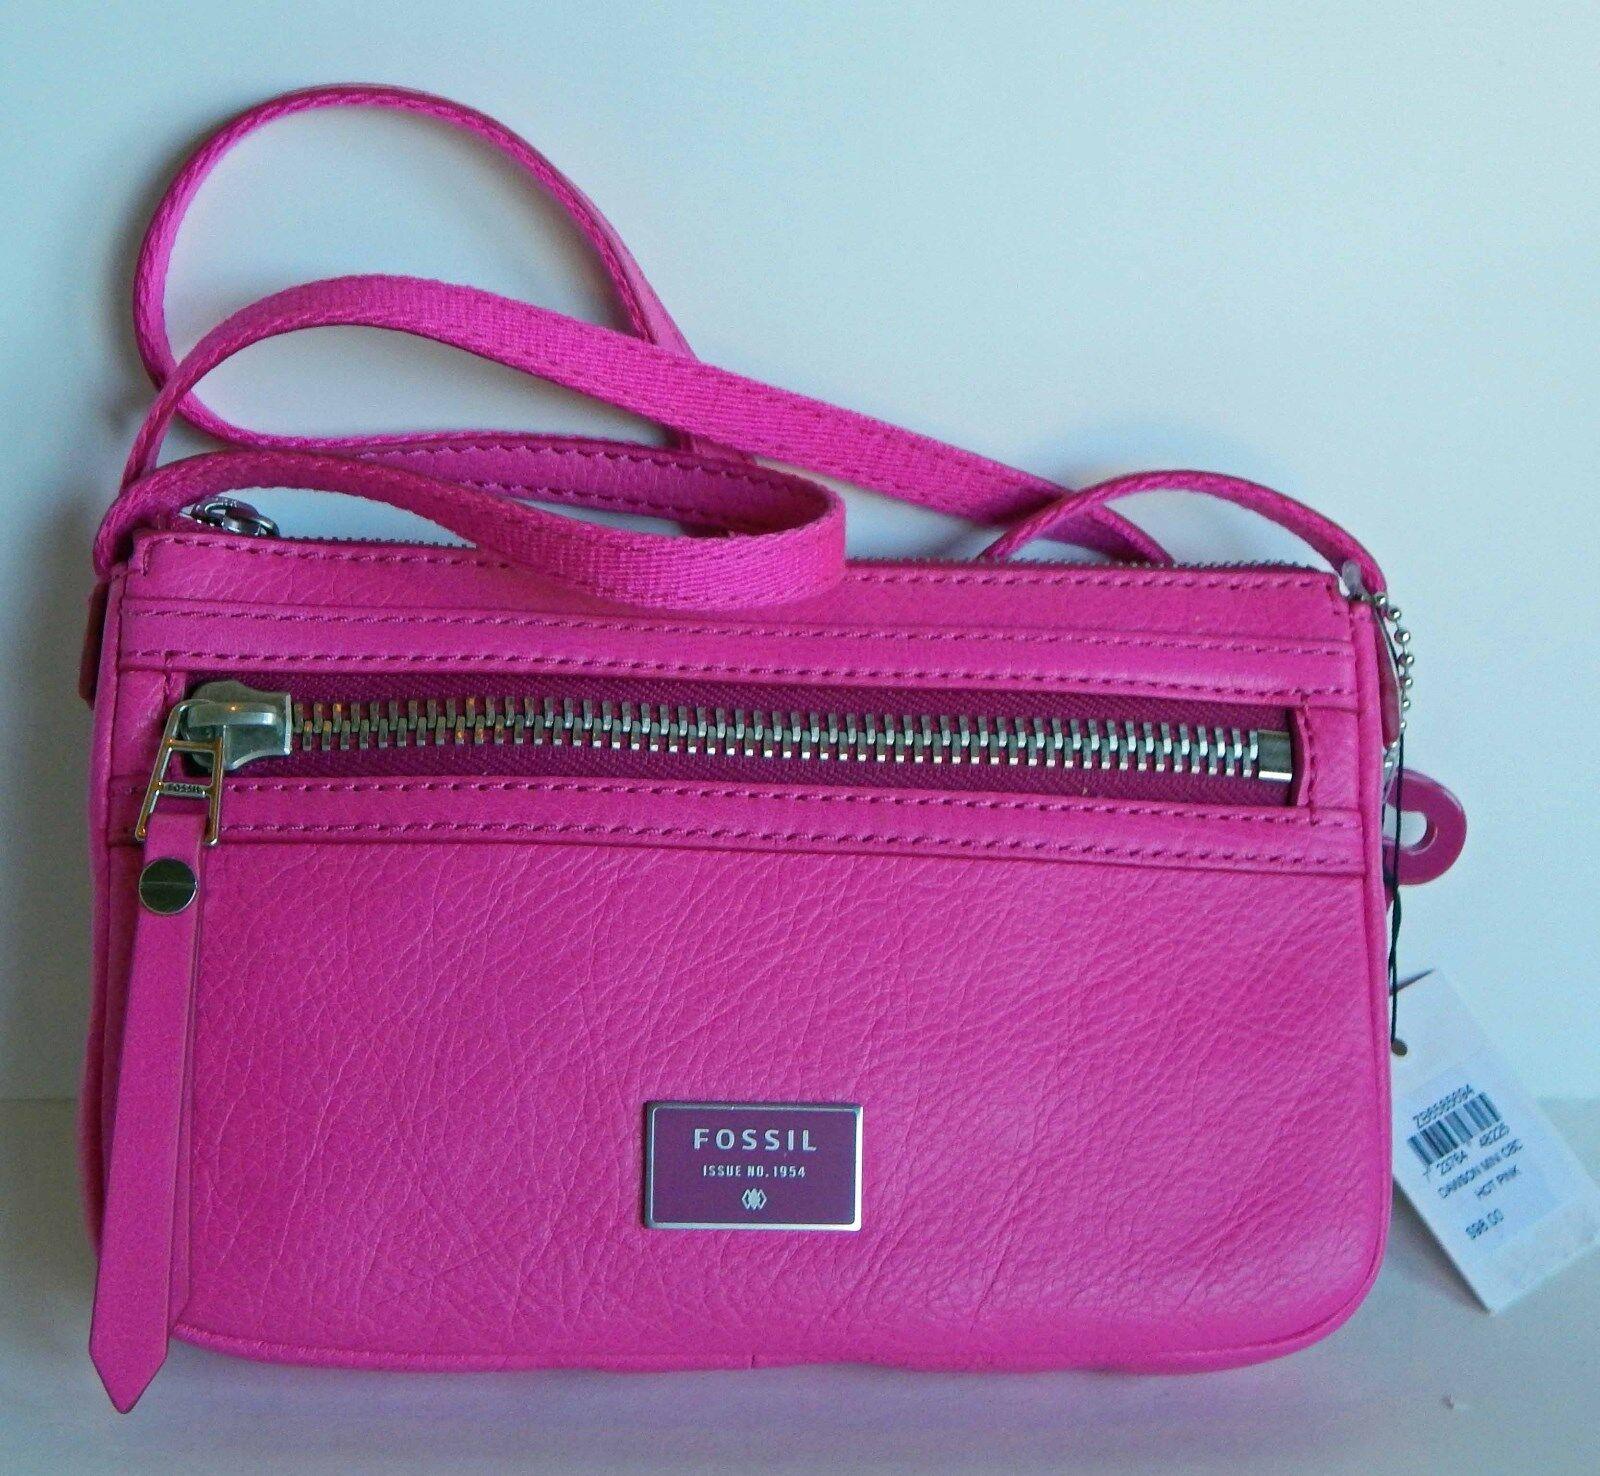 Fossil Dawson Crossbody Handbag Hot Pink Zb 6577694 Daftar Harga Multifunction Black Sl 6675001 Source Leather Shoulder Bag Zb6577694 Ebay